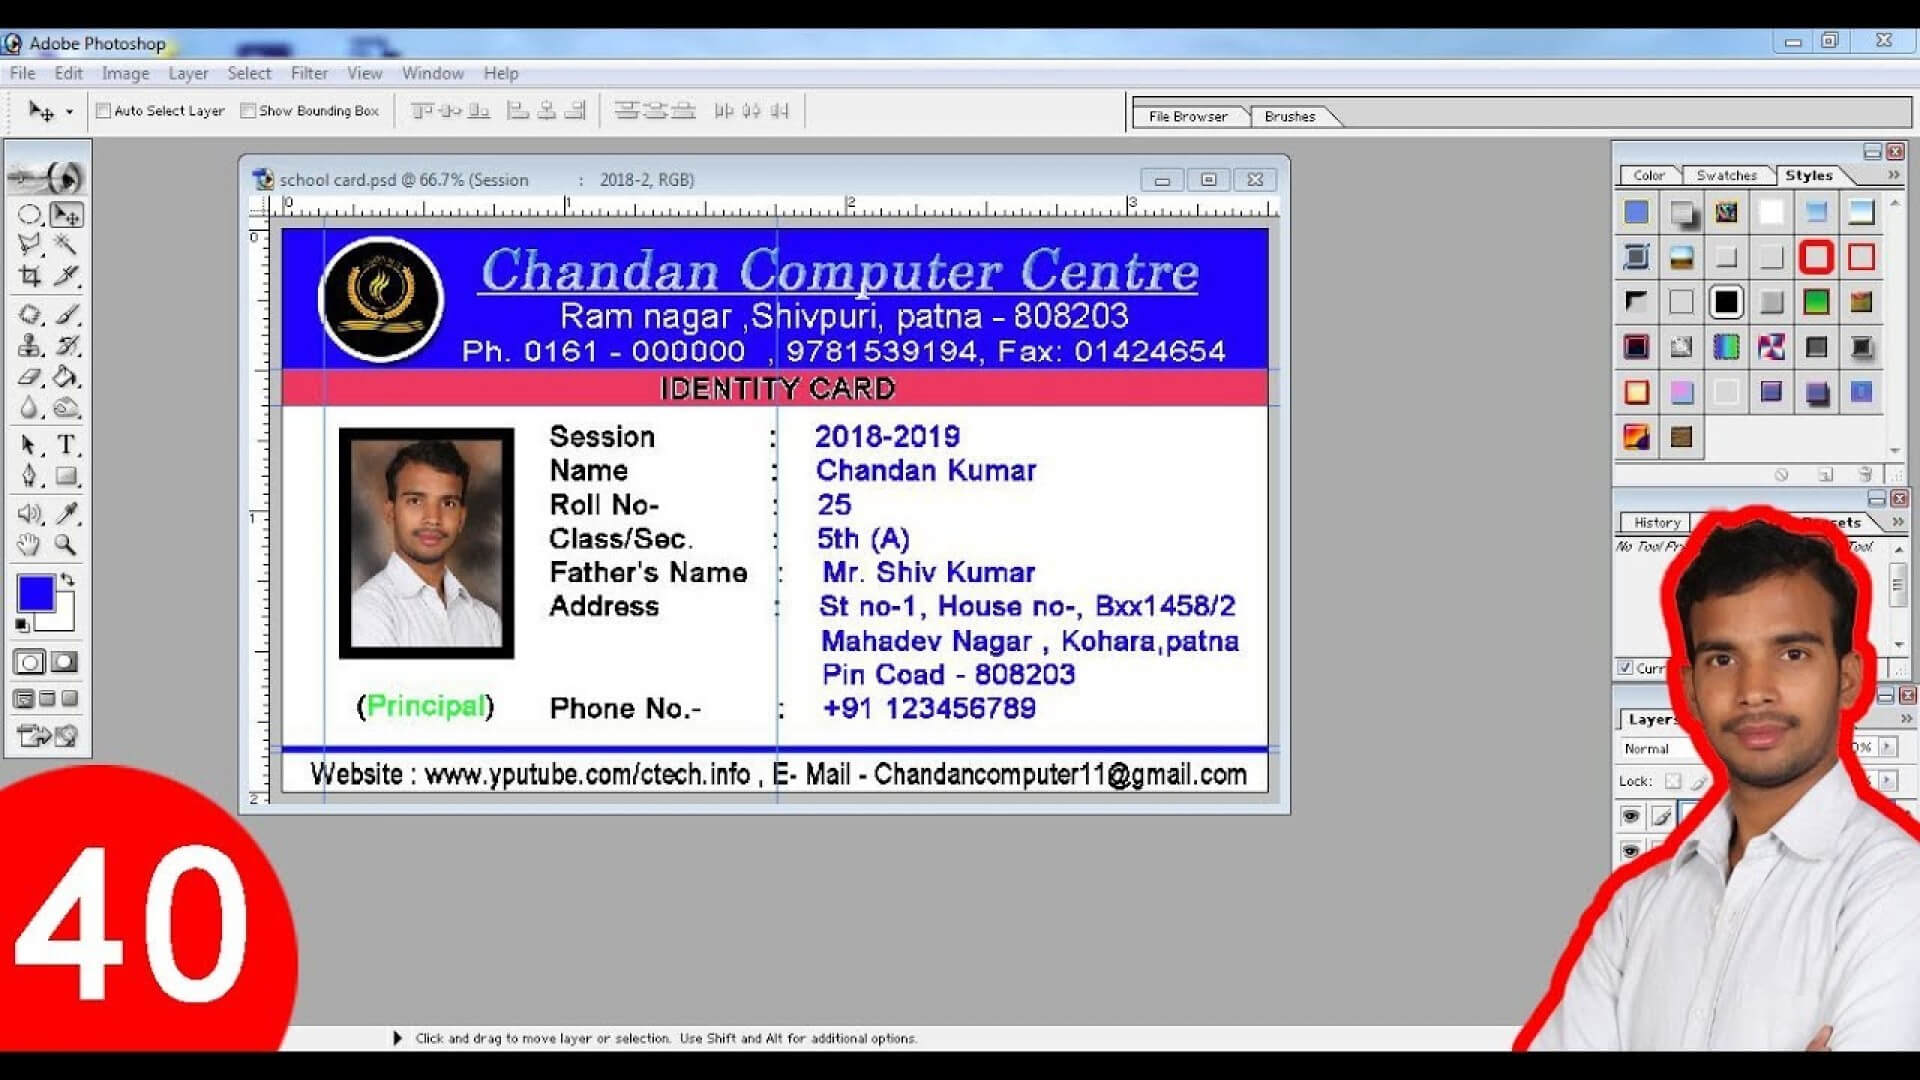 016 Employee Id Card Template Microsoft Word Free Download Intended For Id Card Template For Microsoft Word